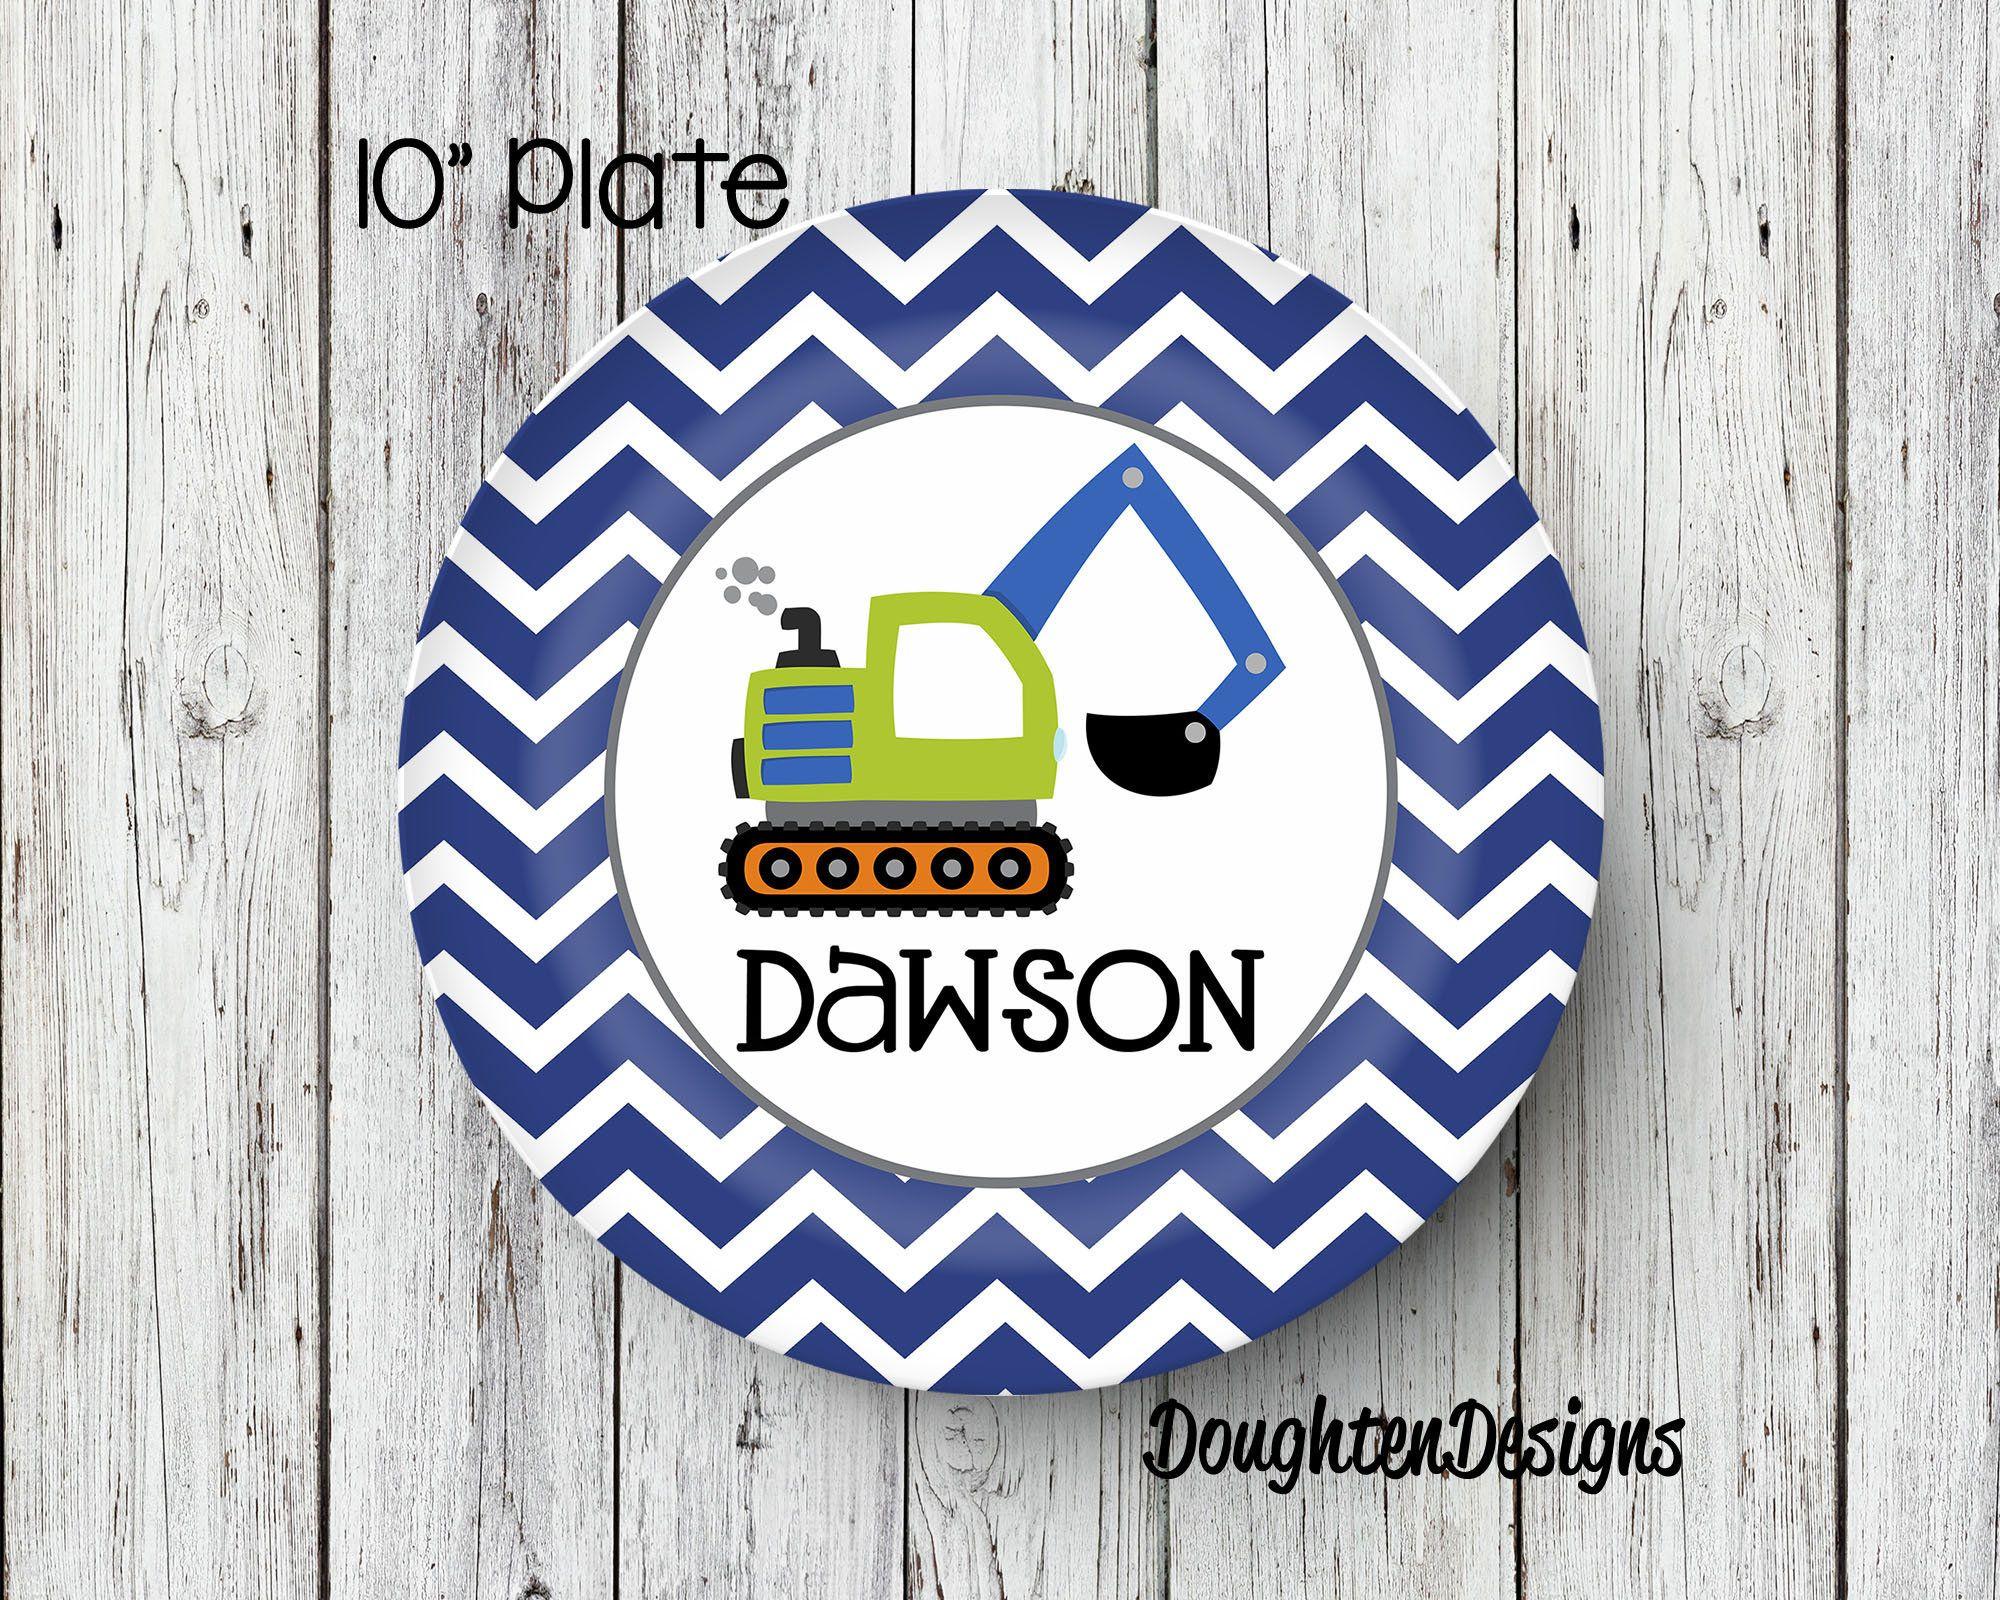 Personalized Melamine Plate Dump Truck plate Truck kids plate personalized kids plate Personalized Plate Kids Plate Melamine Plate  sc 1 st  Pinterest & Personalized Melamine Plate Dump Truck plate Truck kids plate ...